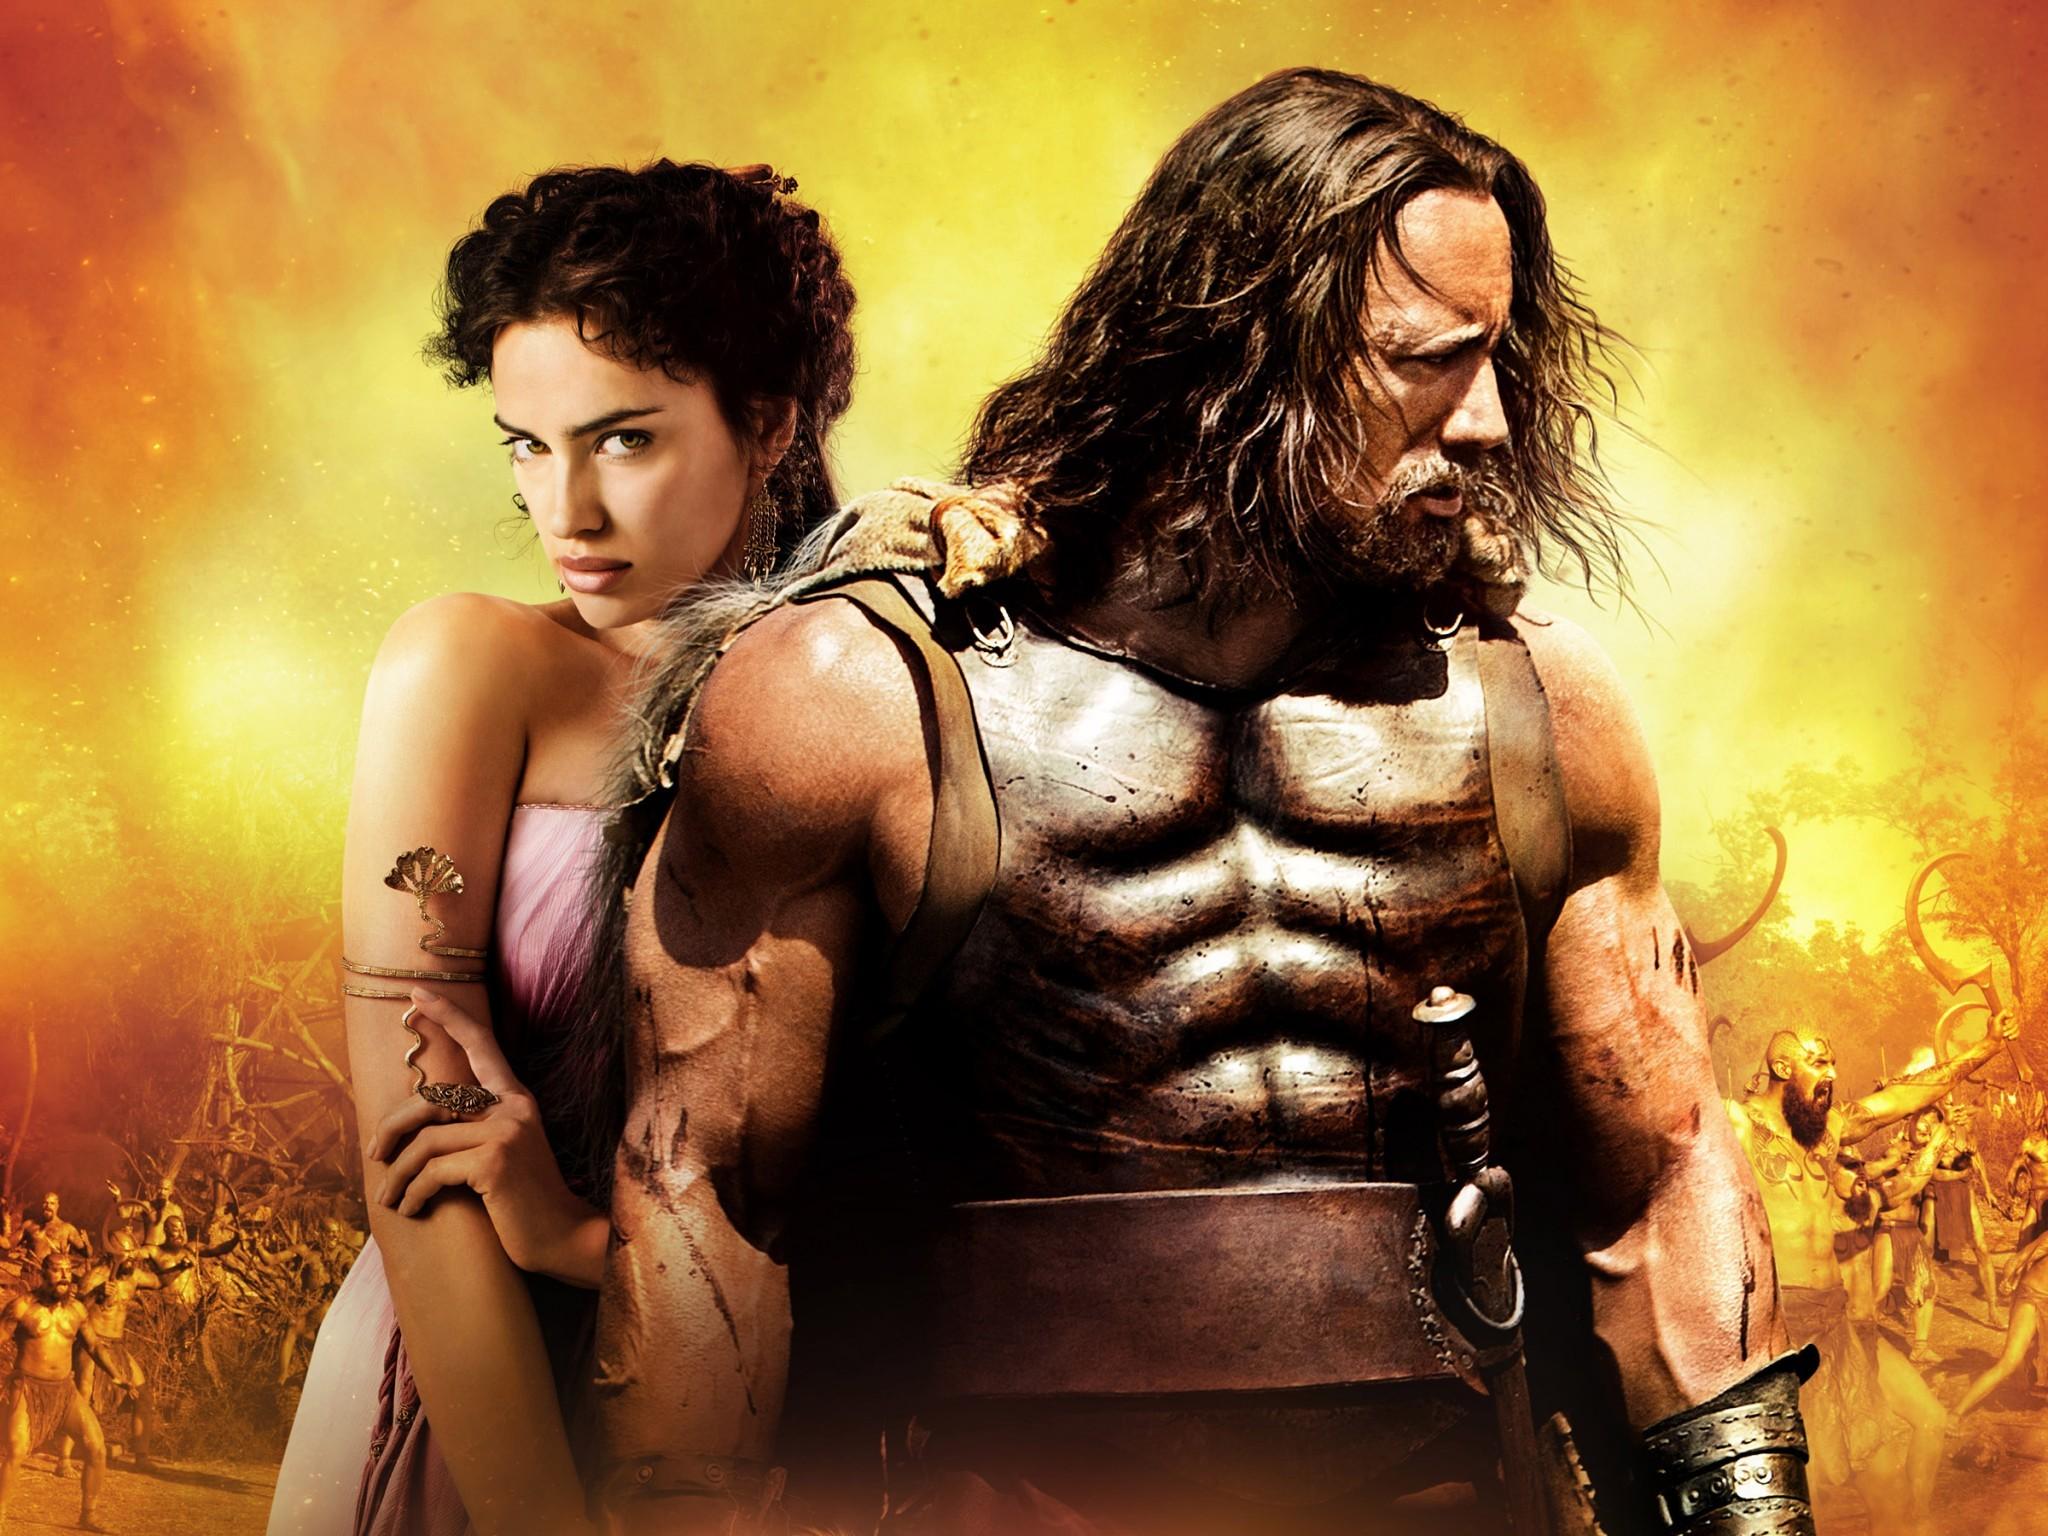 Wonderful Wallpaper Movie Warrior - movies-comics-mythology-Hercules-muscle-screenshot-computer-wallpaper-woman-warrior-170241  Photograph_782170.jpg